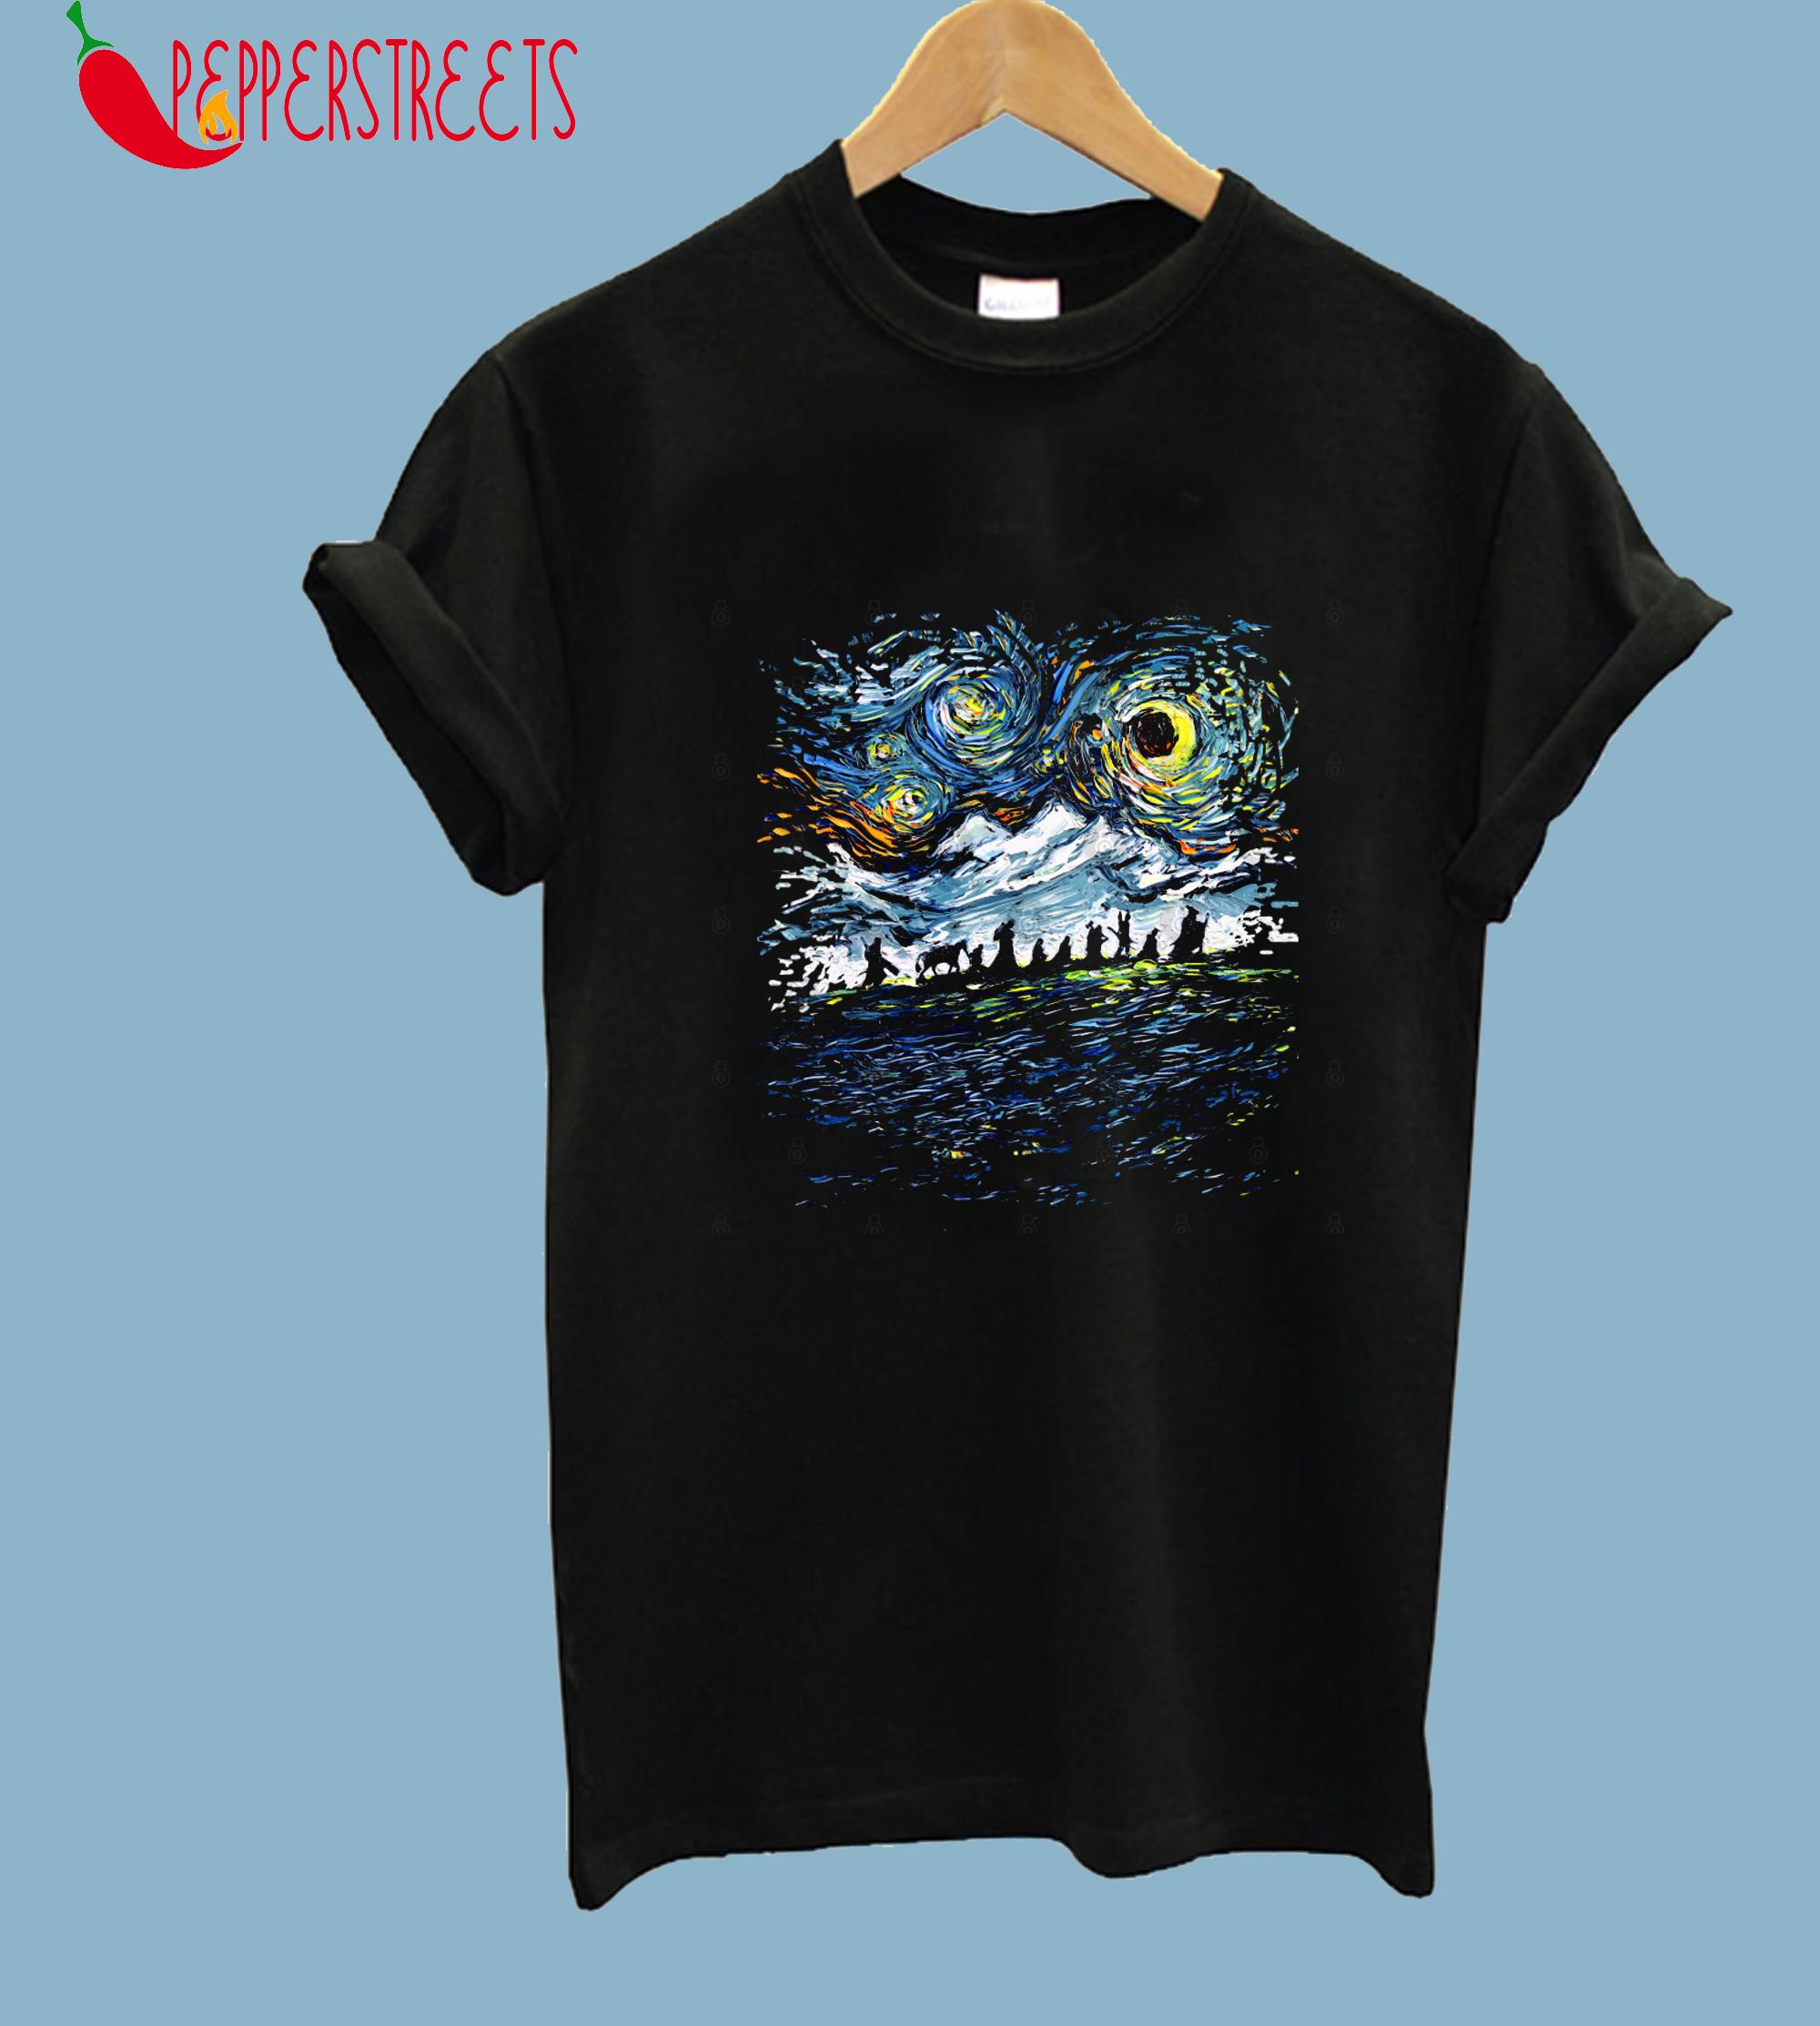 van Gogh Never Saw the Fellowship (version 2) T-Shirt